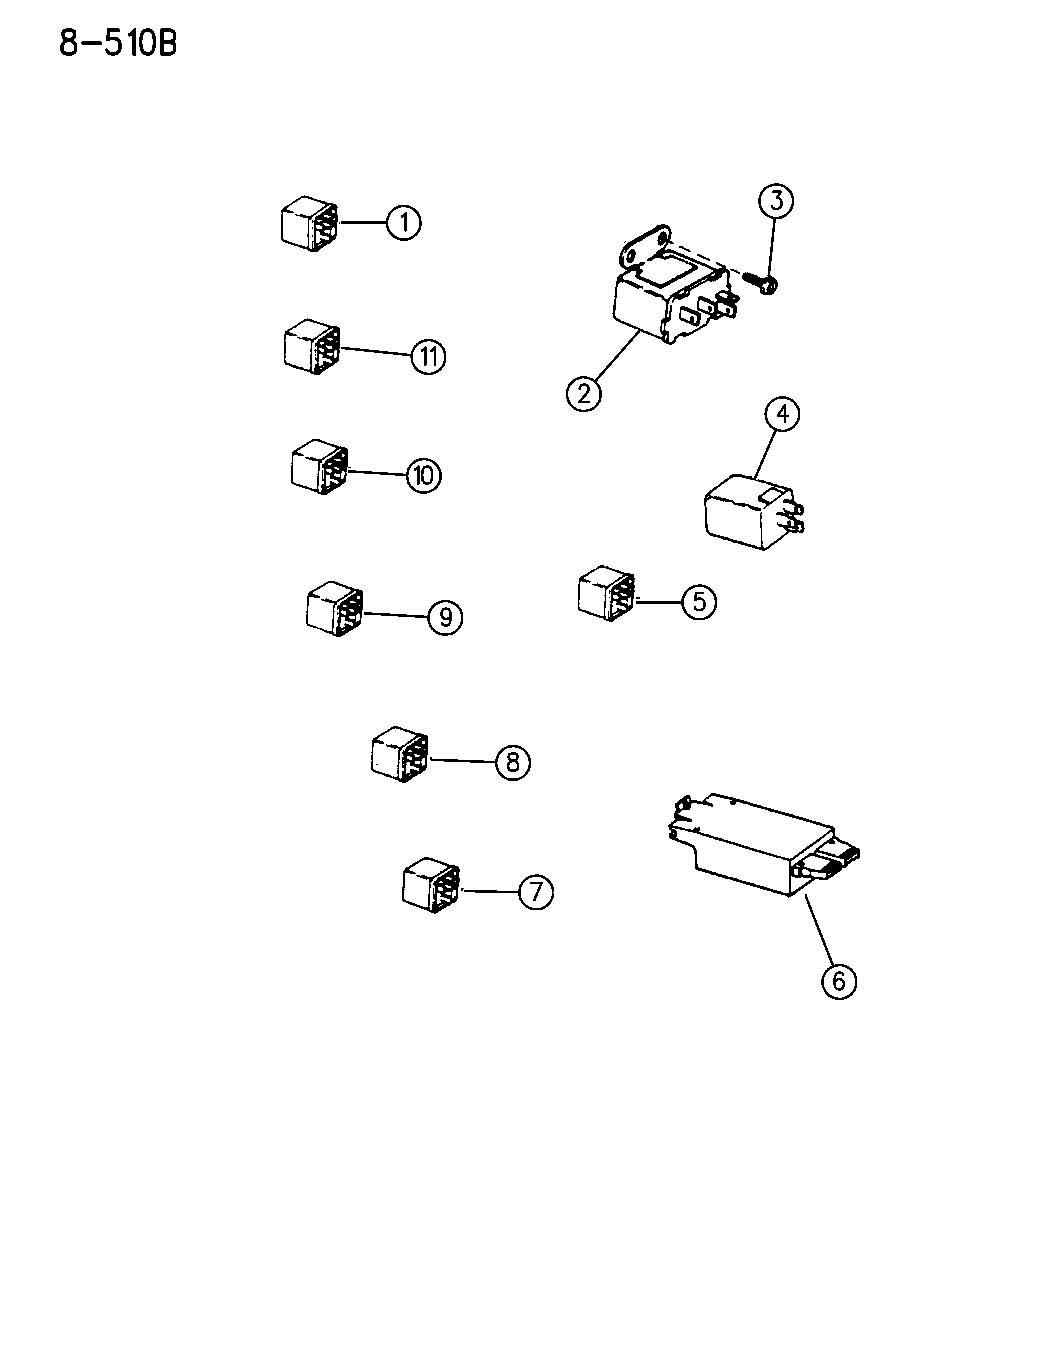 Cp3 Wiring Diagram, Cp3, Get Free Image About Wiring Diagram